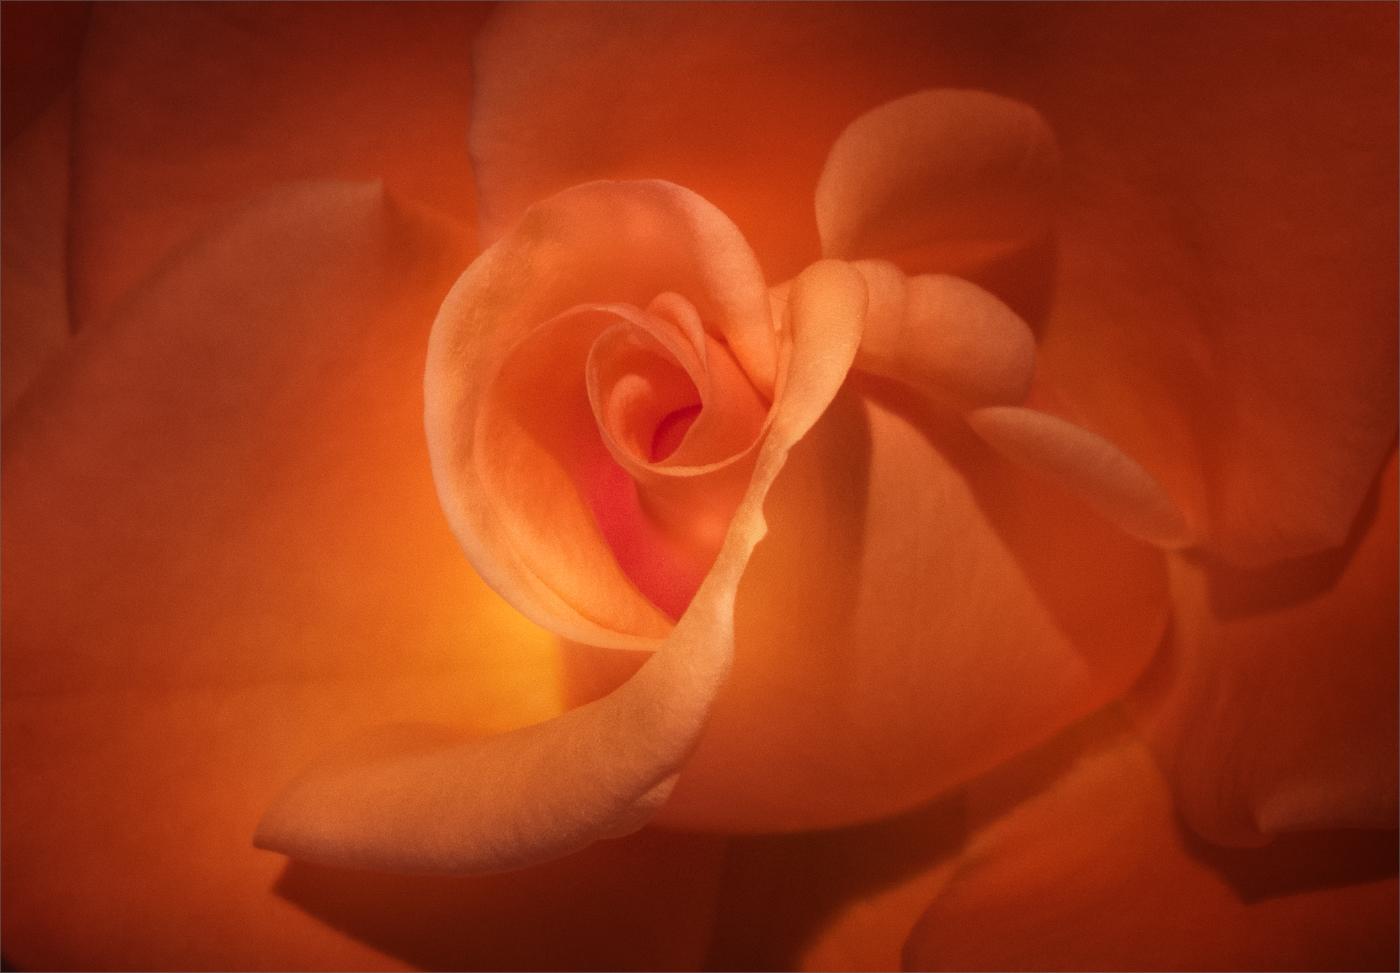 ORANGE ROSE by Ken Grant